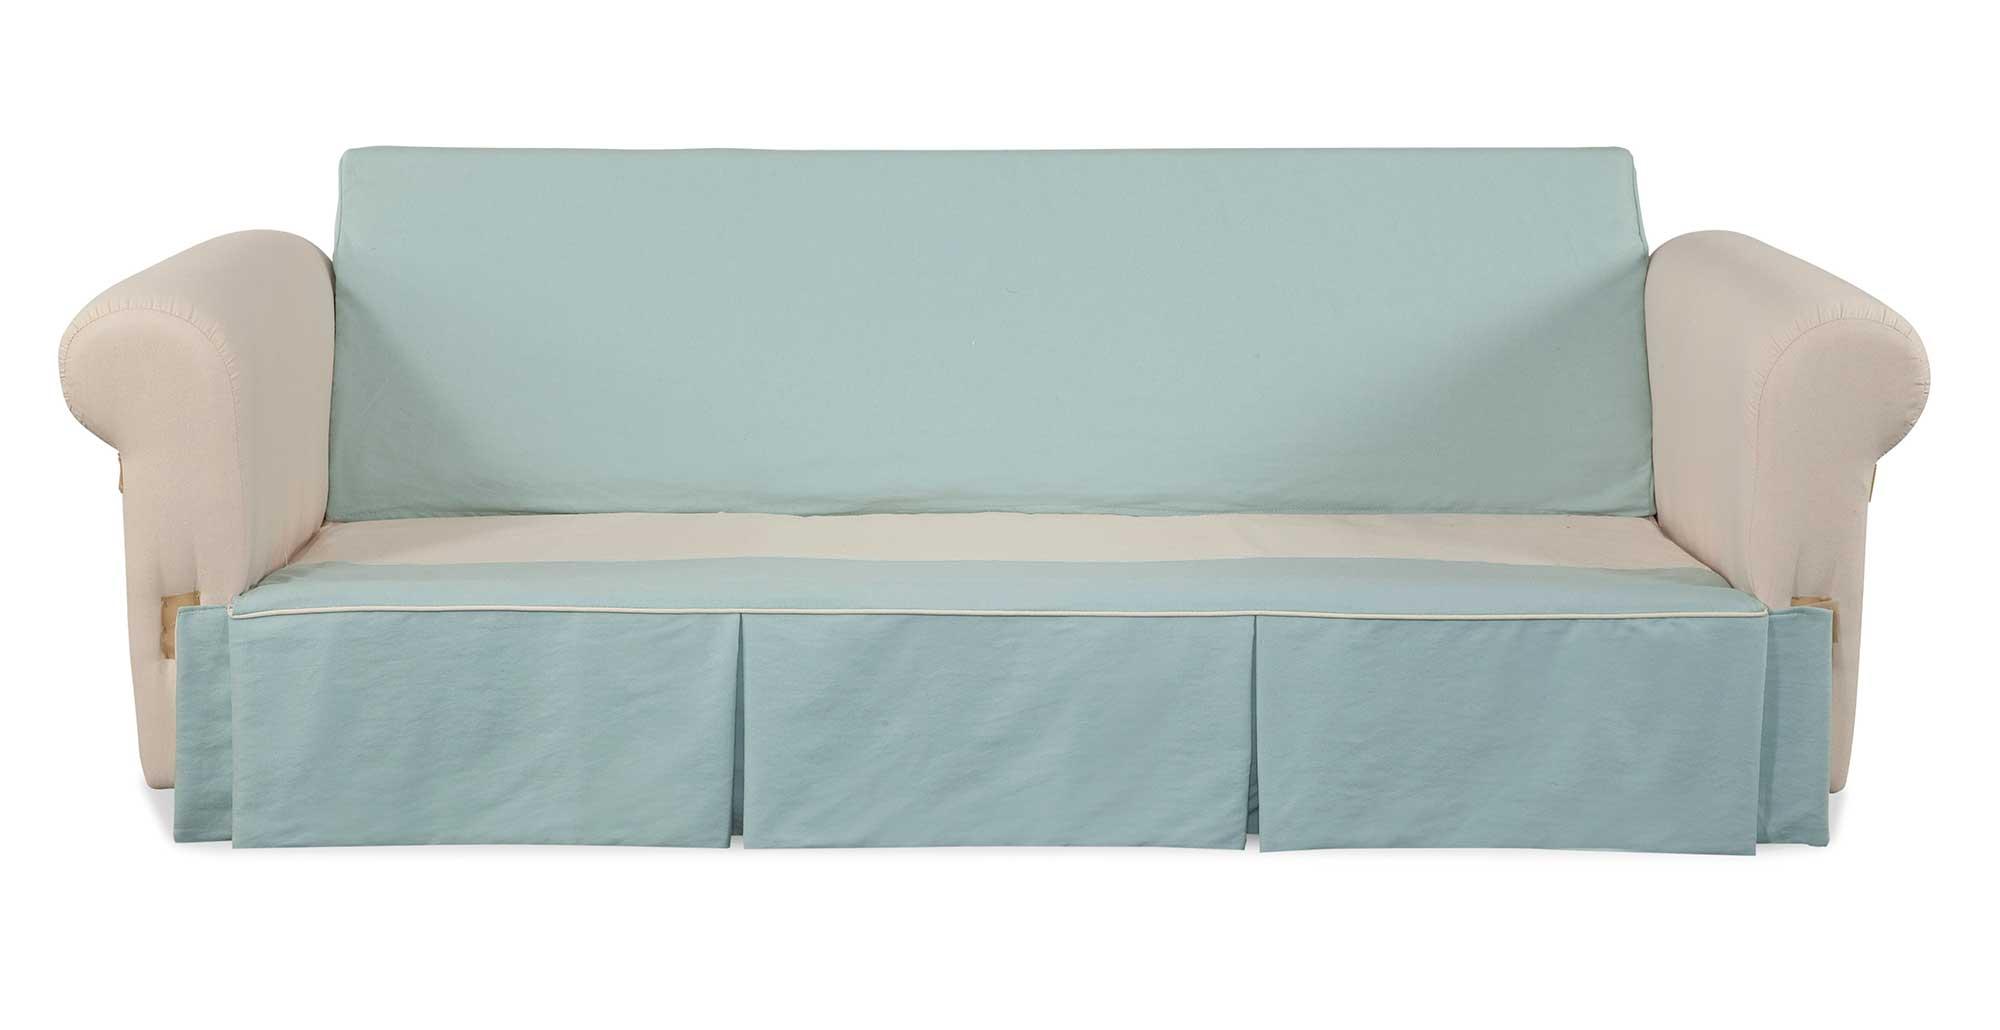 greenfront furniture sofas sofa mart tyler tx four seasons slipcovered shapeyourminds